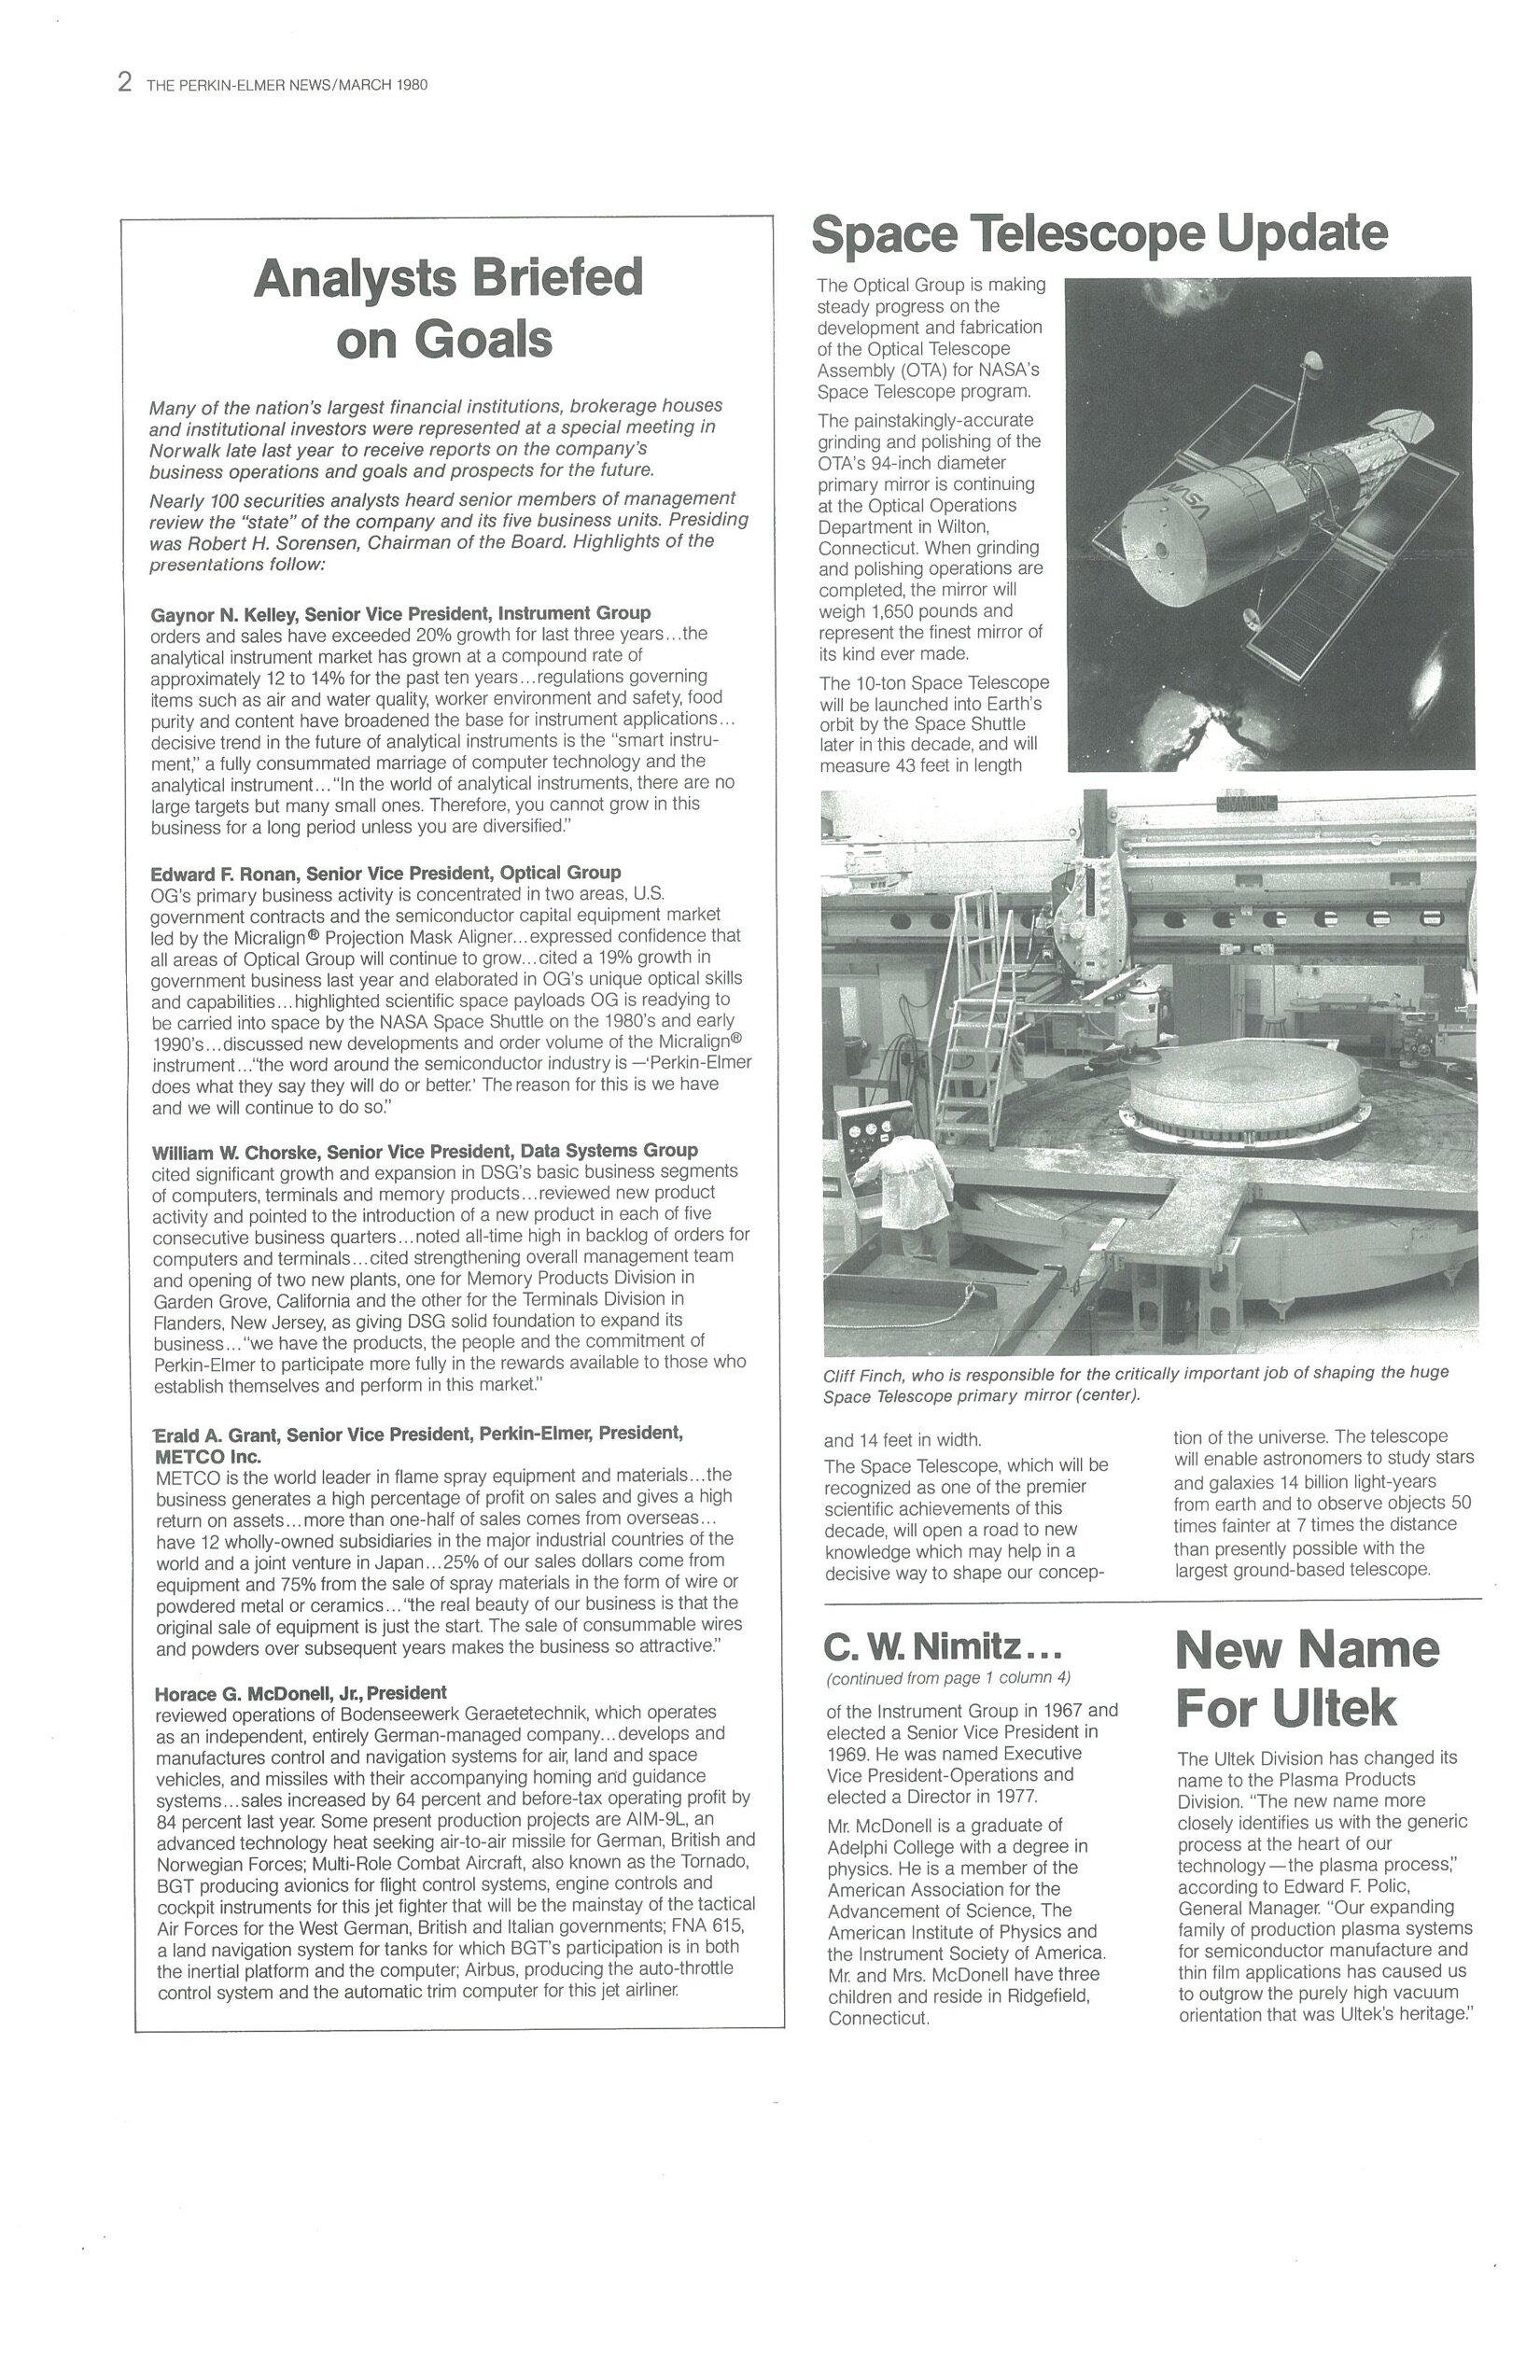 vol 23 num 1, page 2.jpg